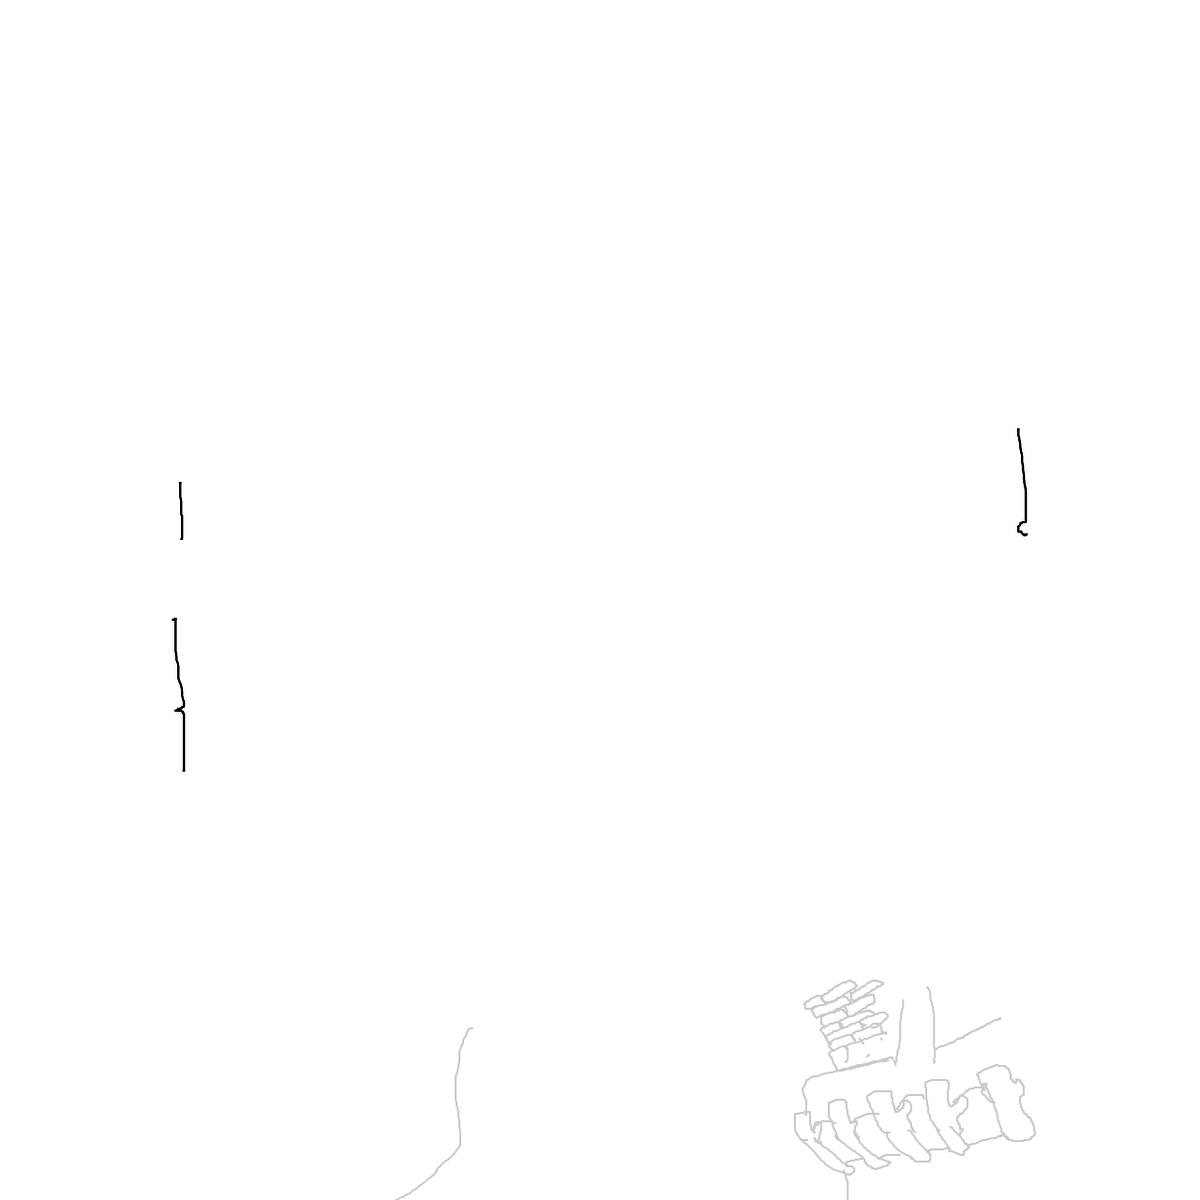 BAAAM drawing#22253 lat:78.4192504882812500lng: -4.4740619659423830